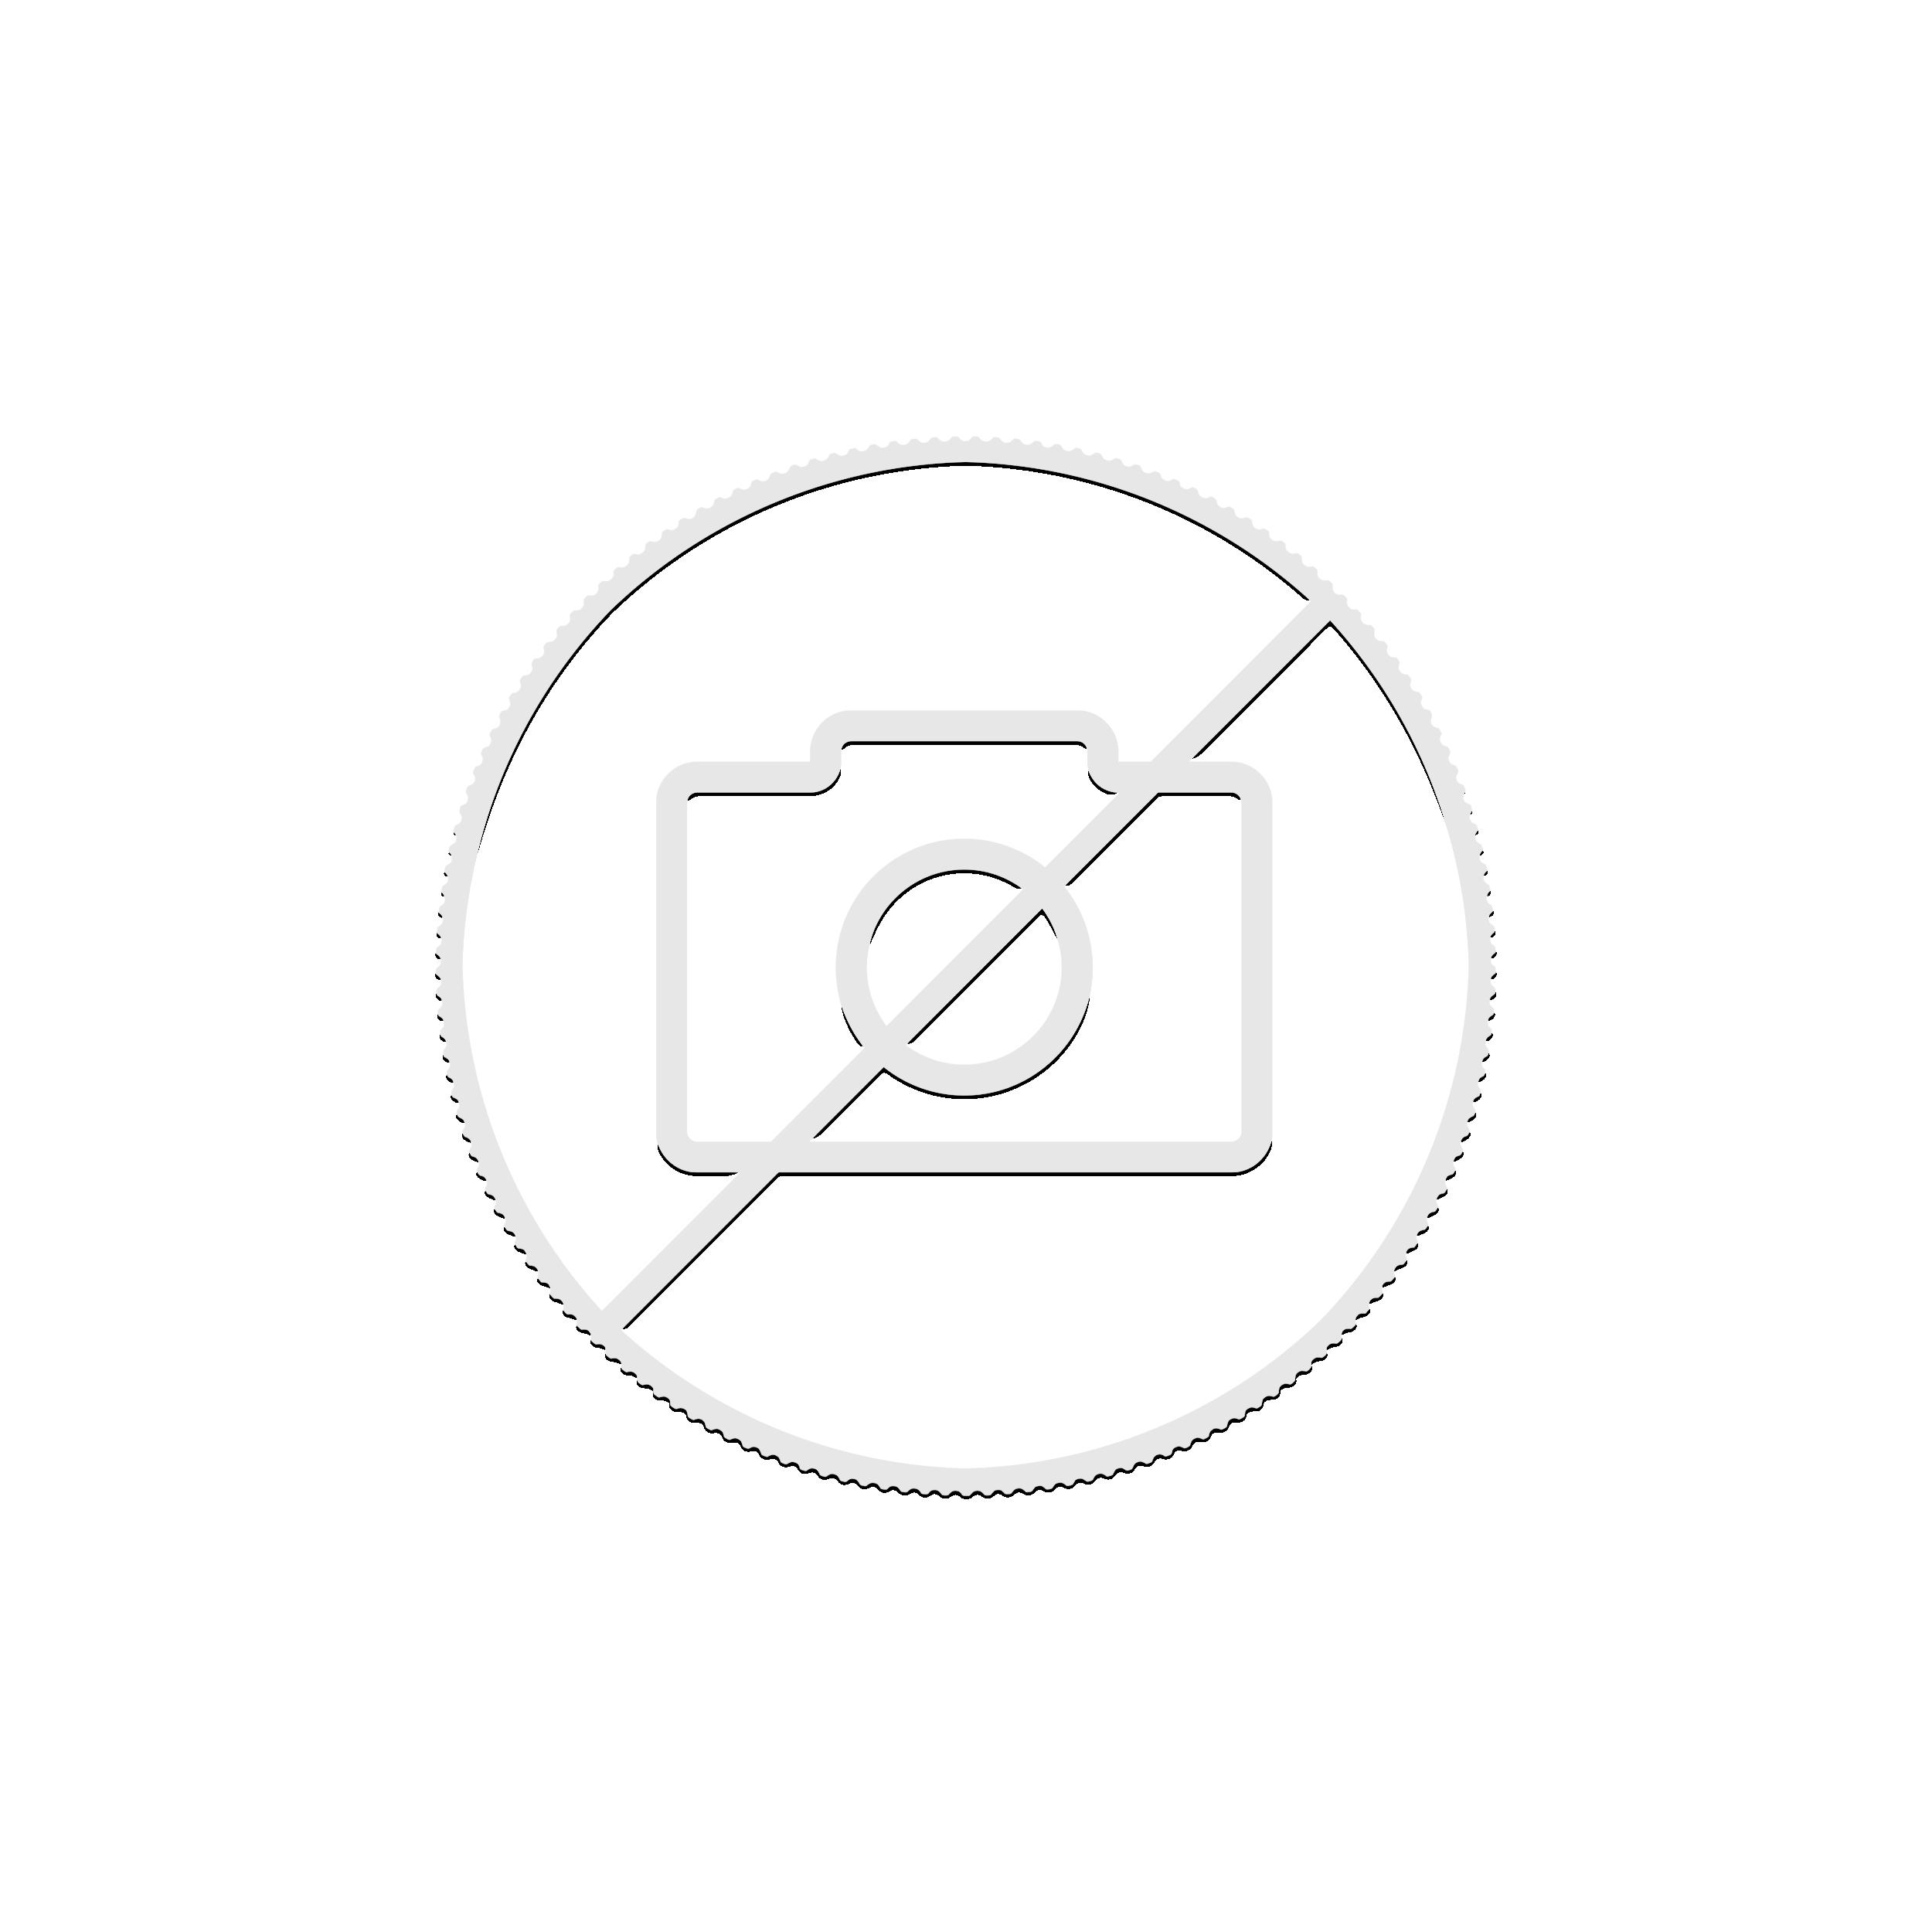 30 gram zilveren munt gouden holo serie Panda 2021